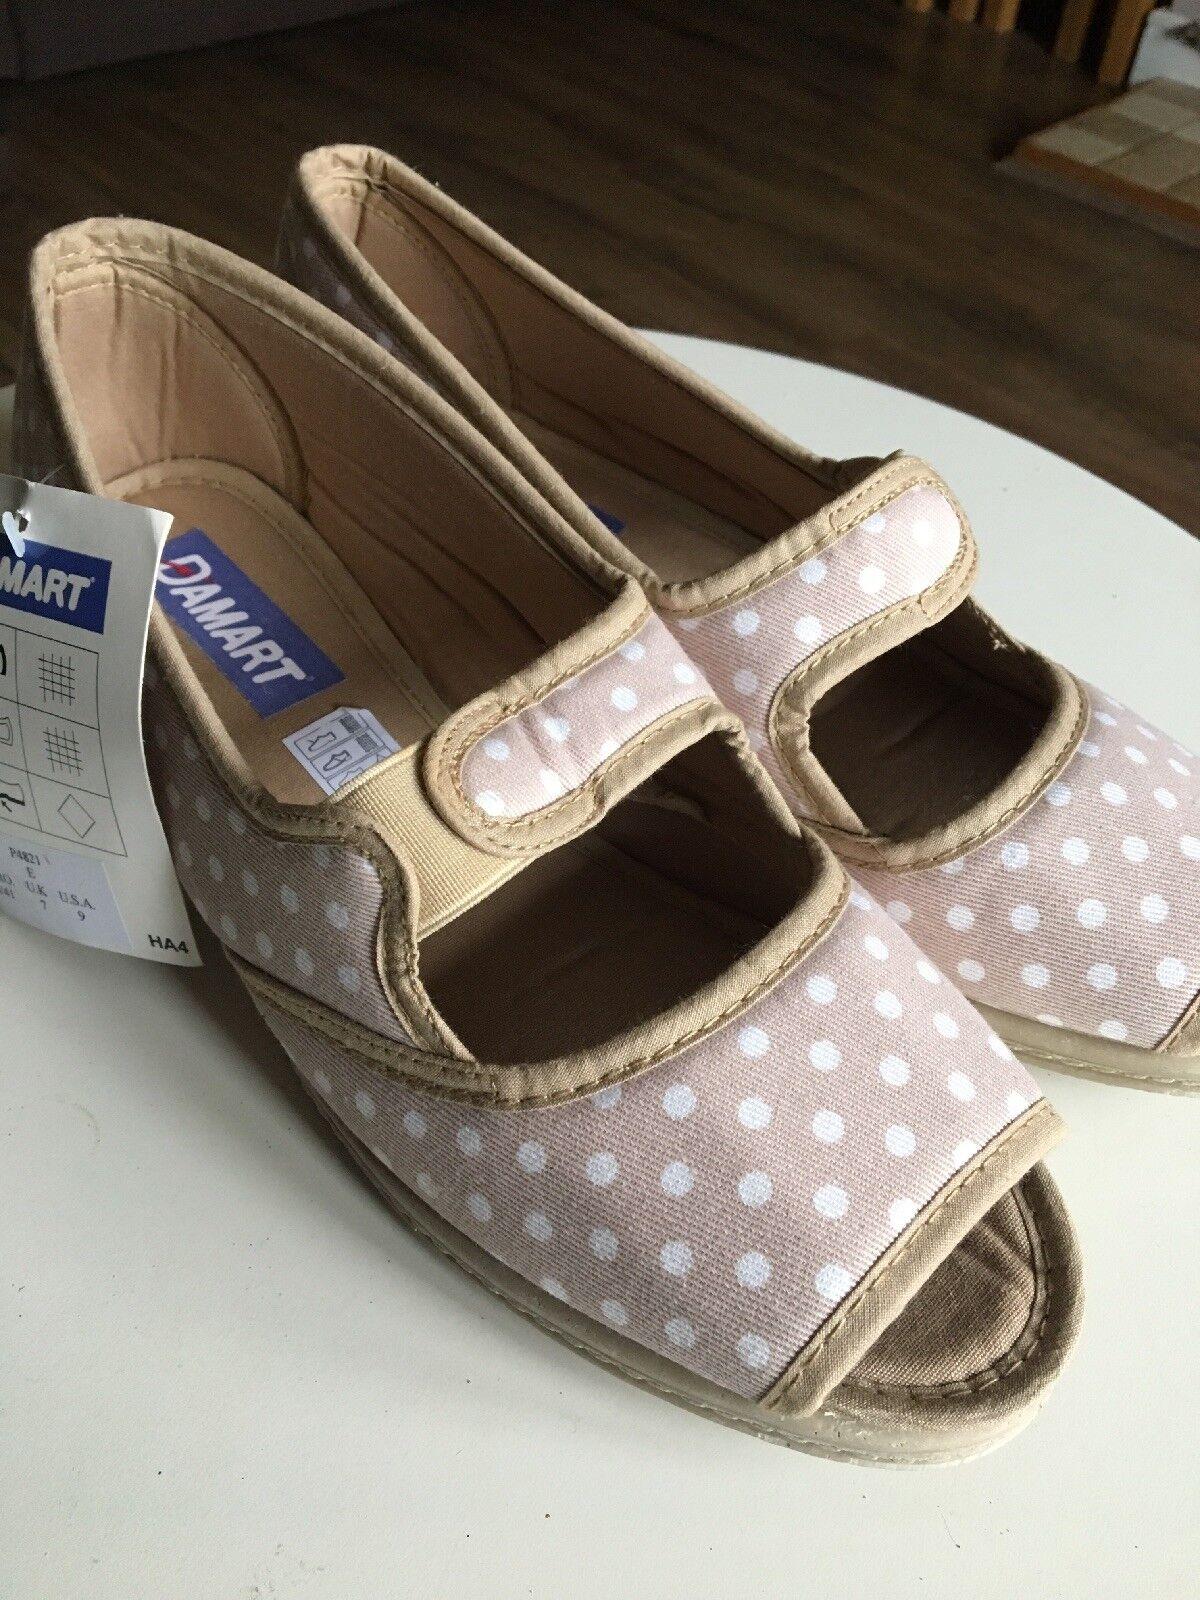 Damart Womens E Wider Fit Beige Spotty Sandals  Open Toe New Sandals Spotty / Slippers f6175e